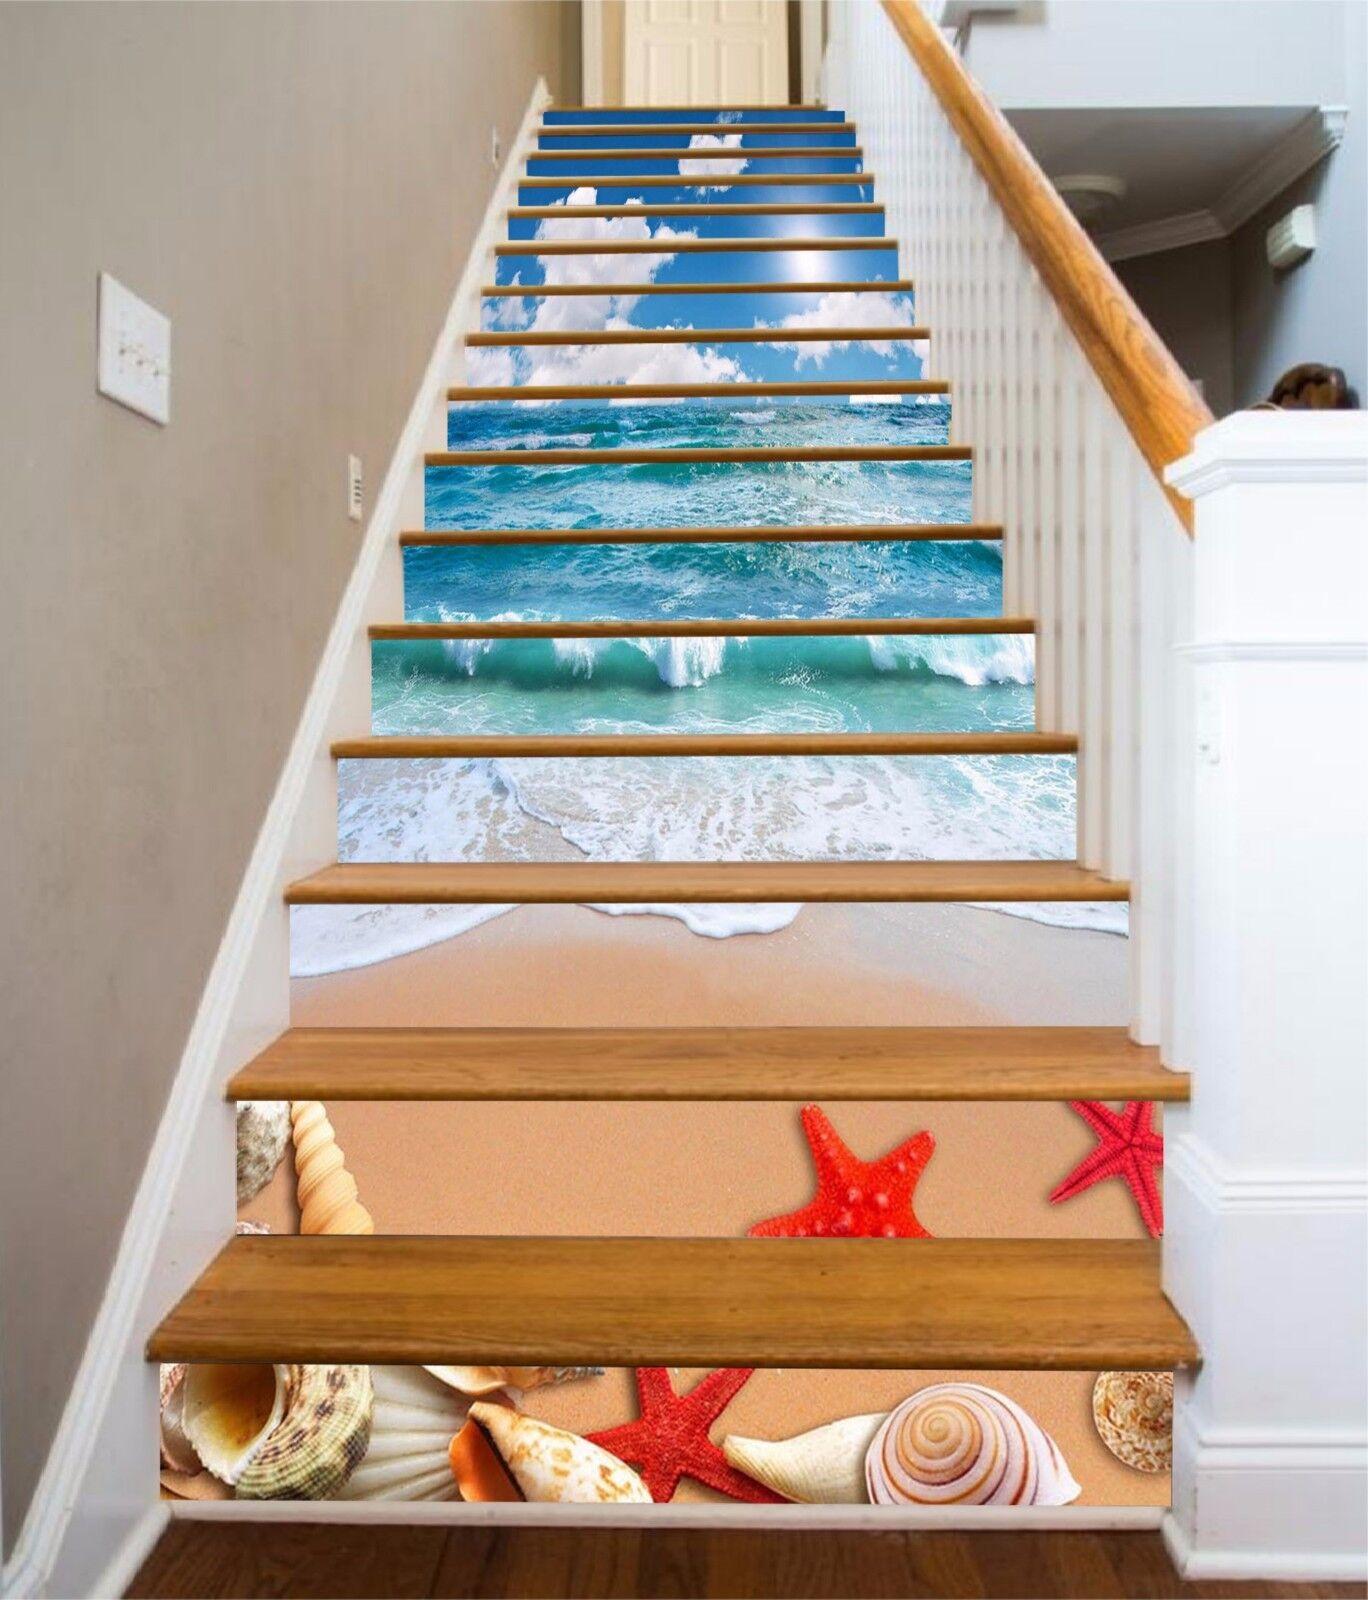 3D Beach View 014 Stairs Risers Decoration Photo Mural Vinyl Decal WandPapier US